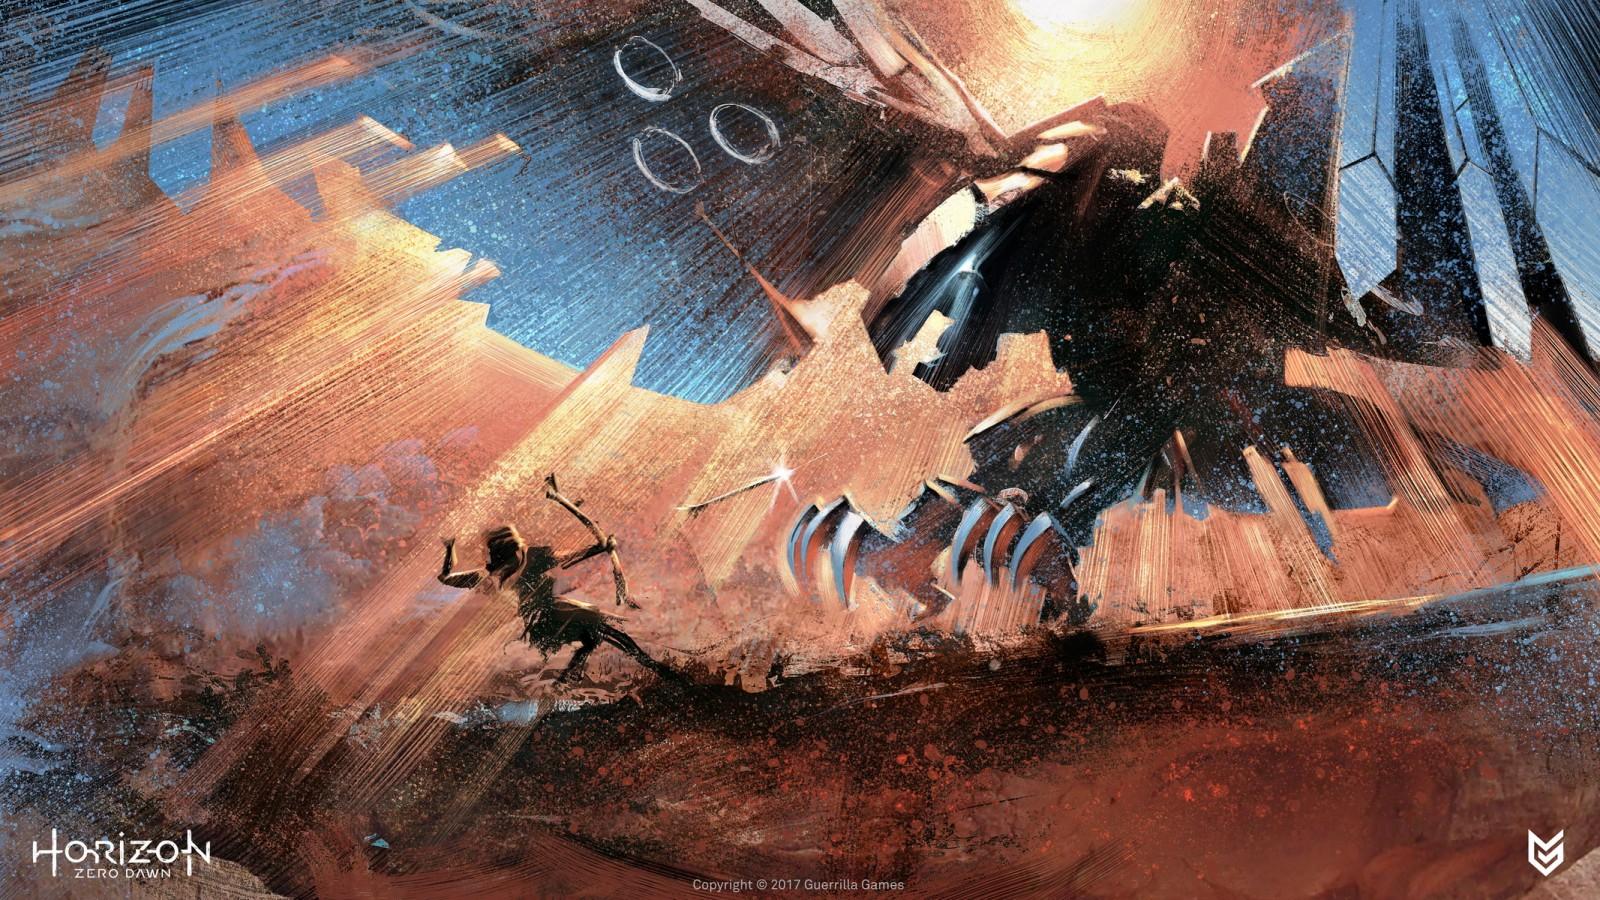 Cute Star Wars Wallpaper Horizon Zero Dawn Limited Edition Artbook Wallpapers Hd